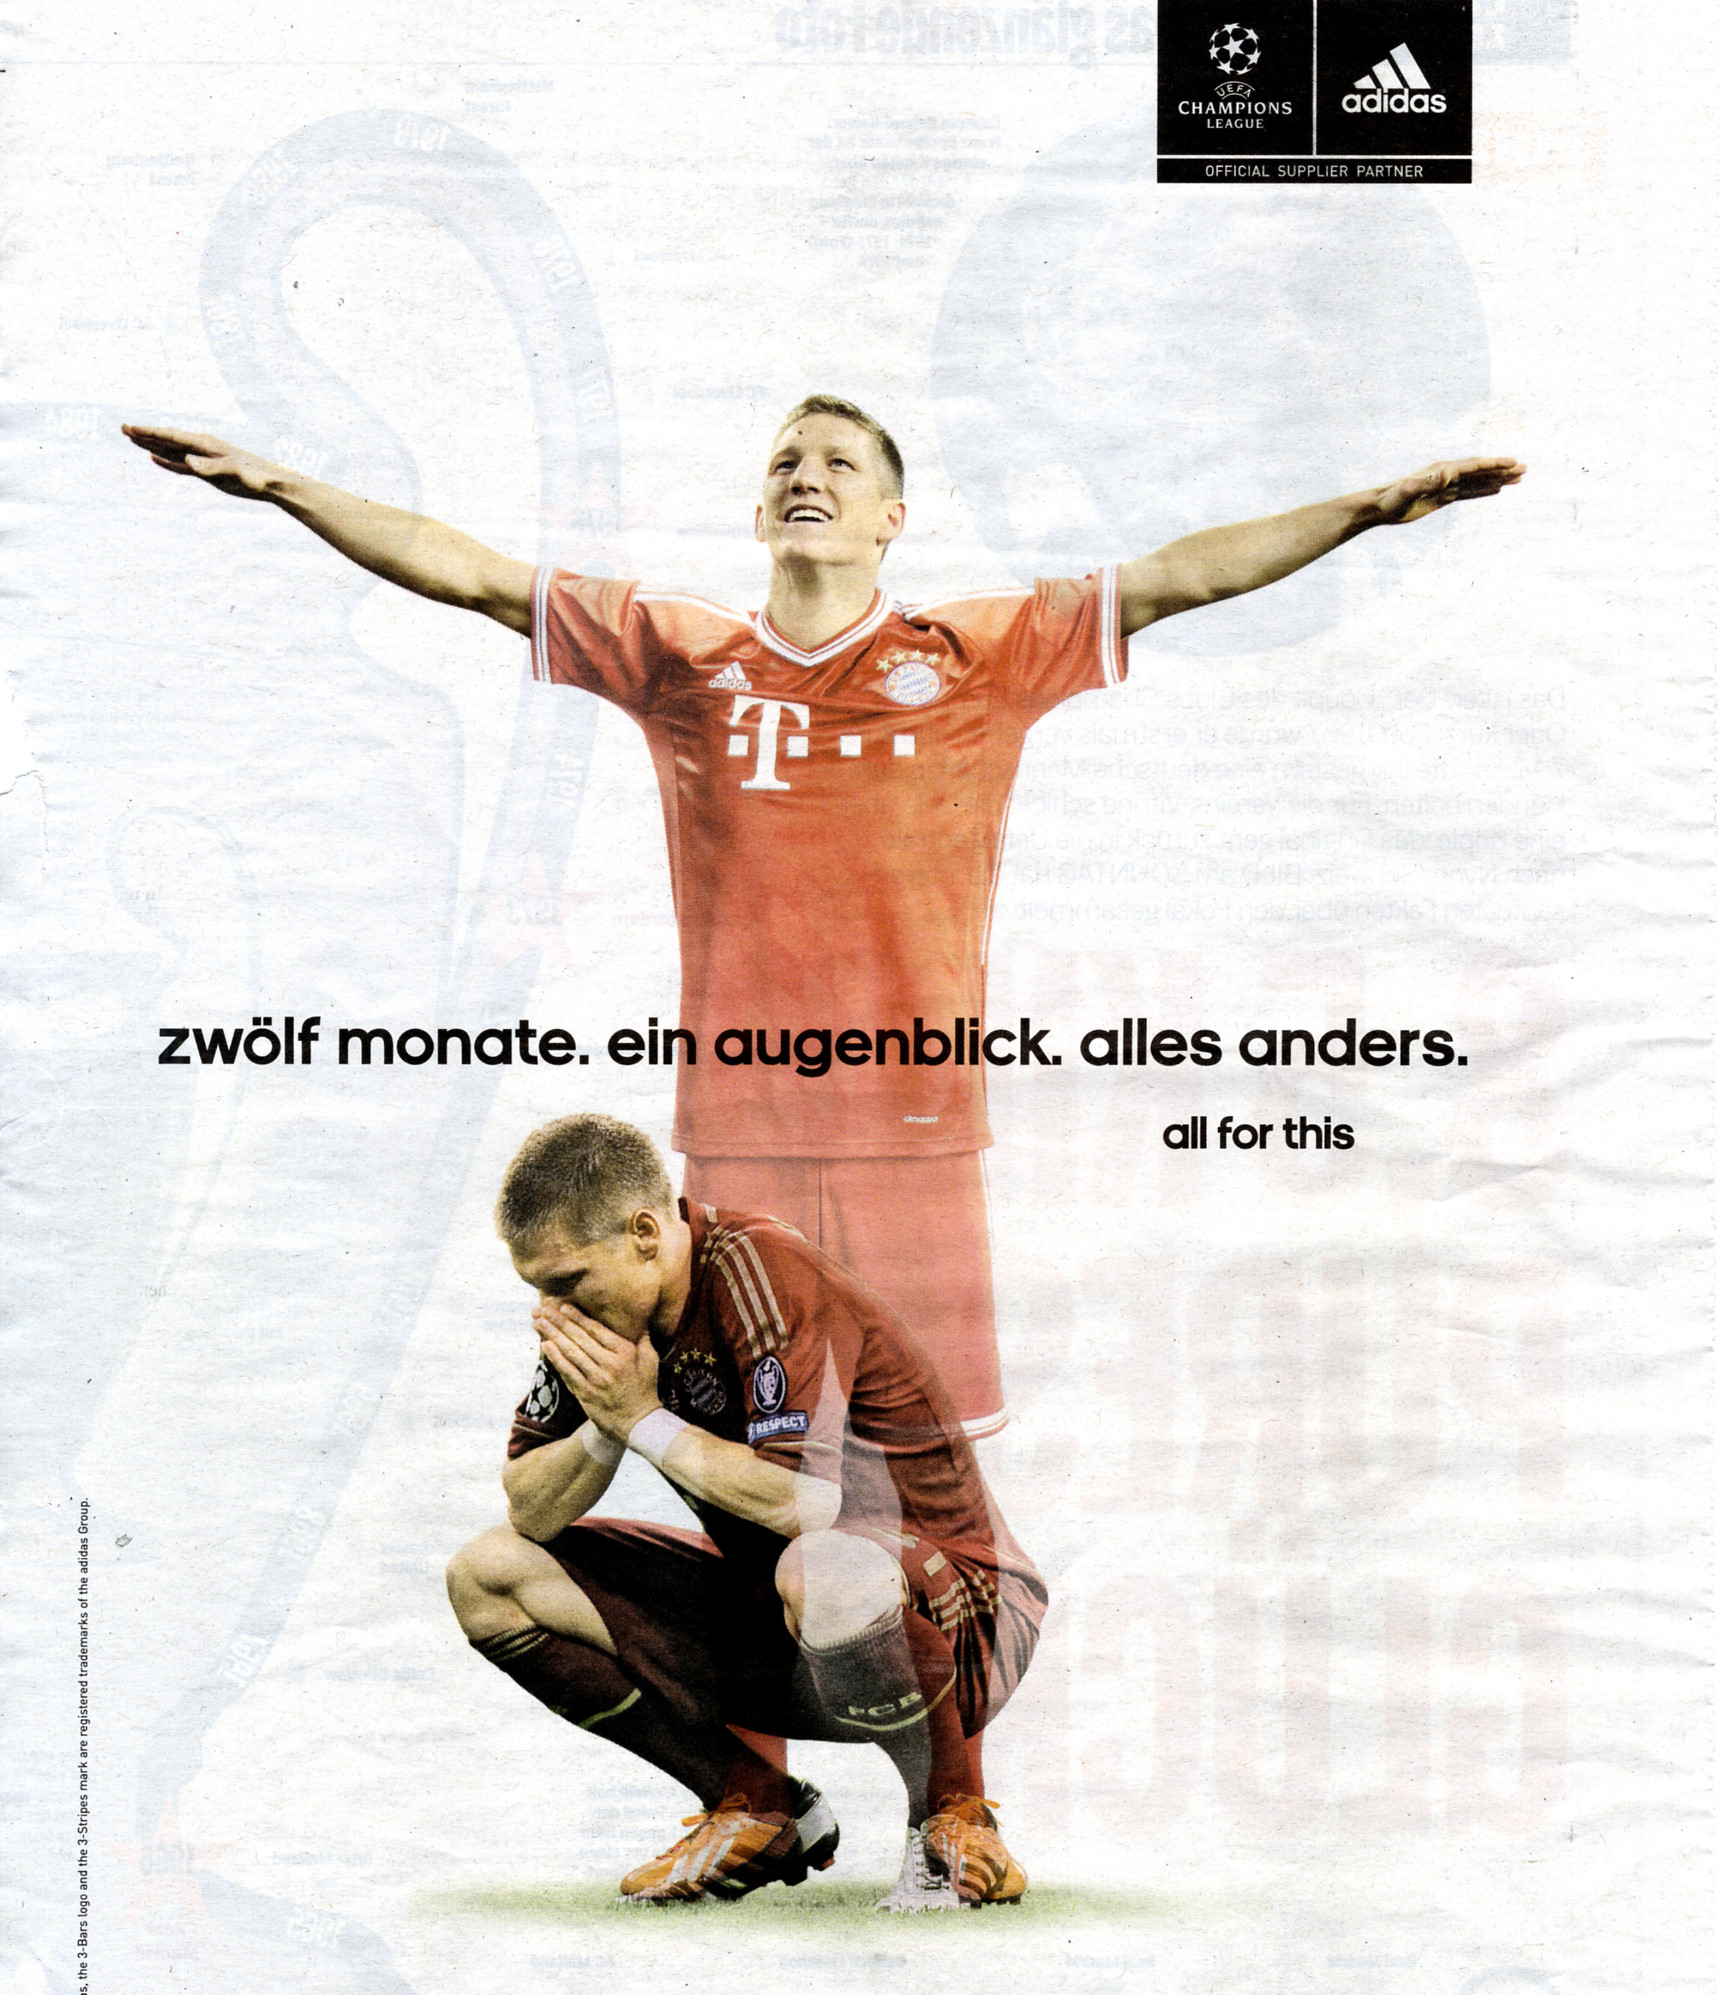 bayern münchen champions league sieger